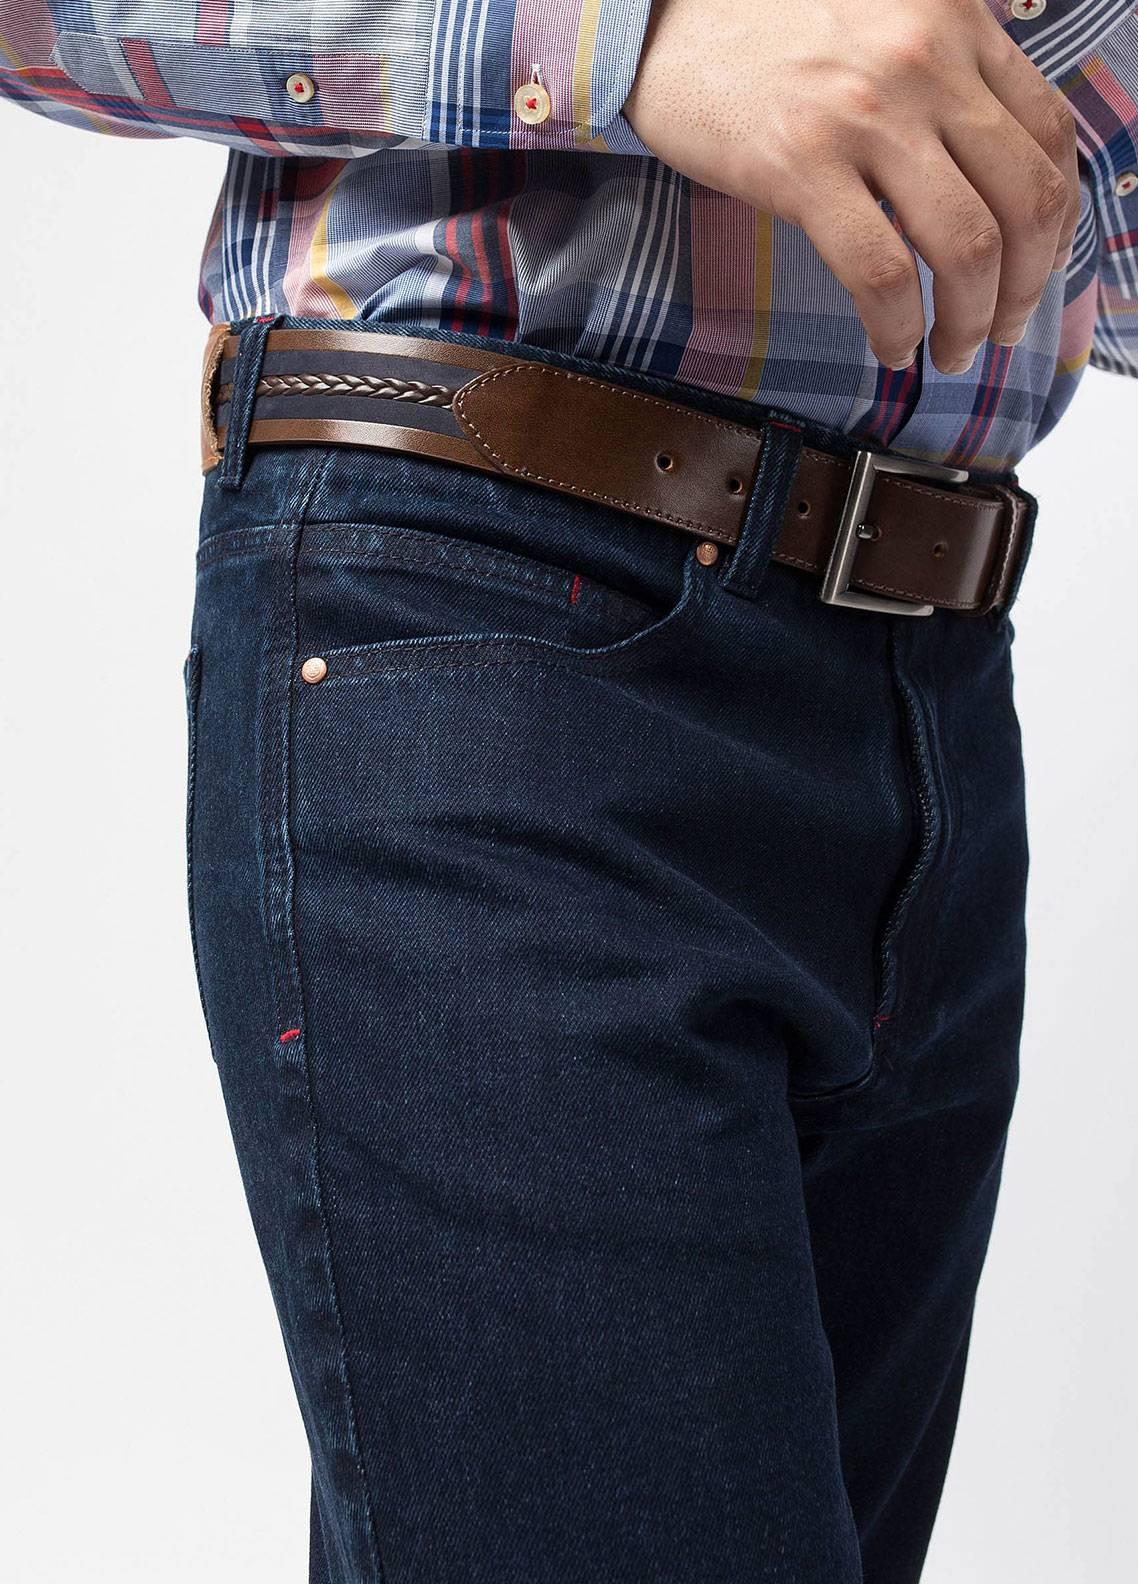 Brumano Cotton Denim Jeans for Men - Blue 0-50-0018-379